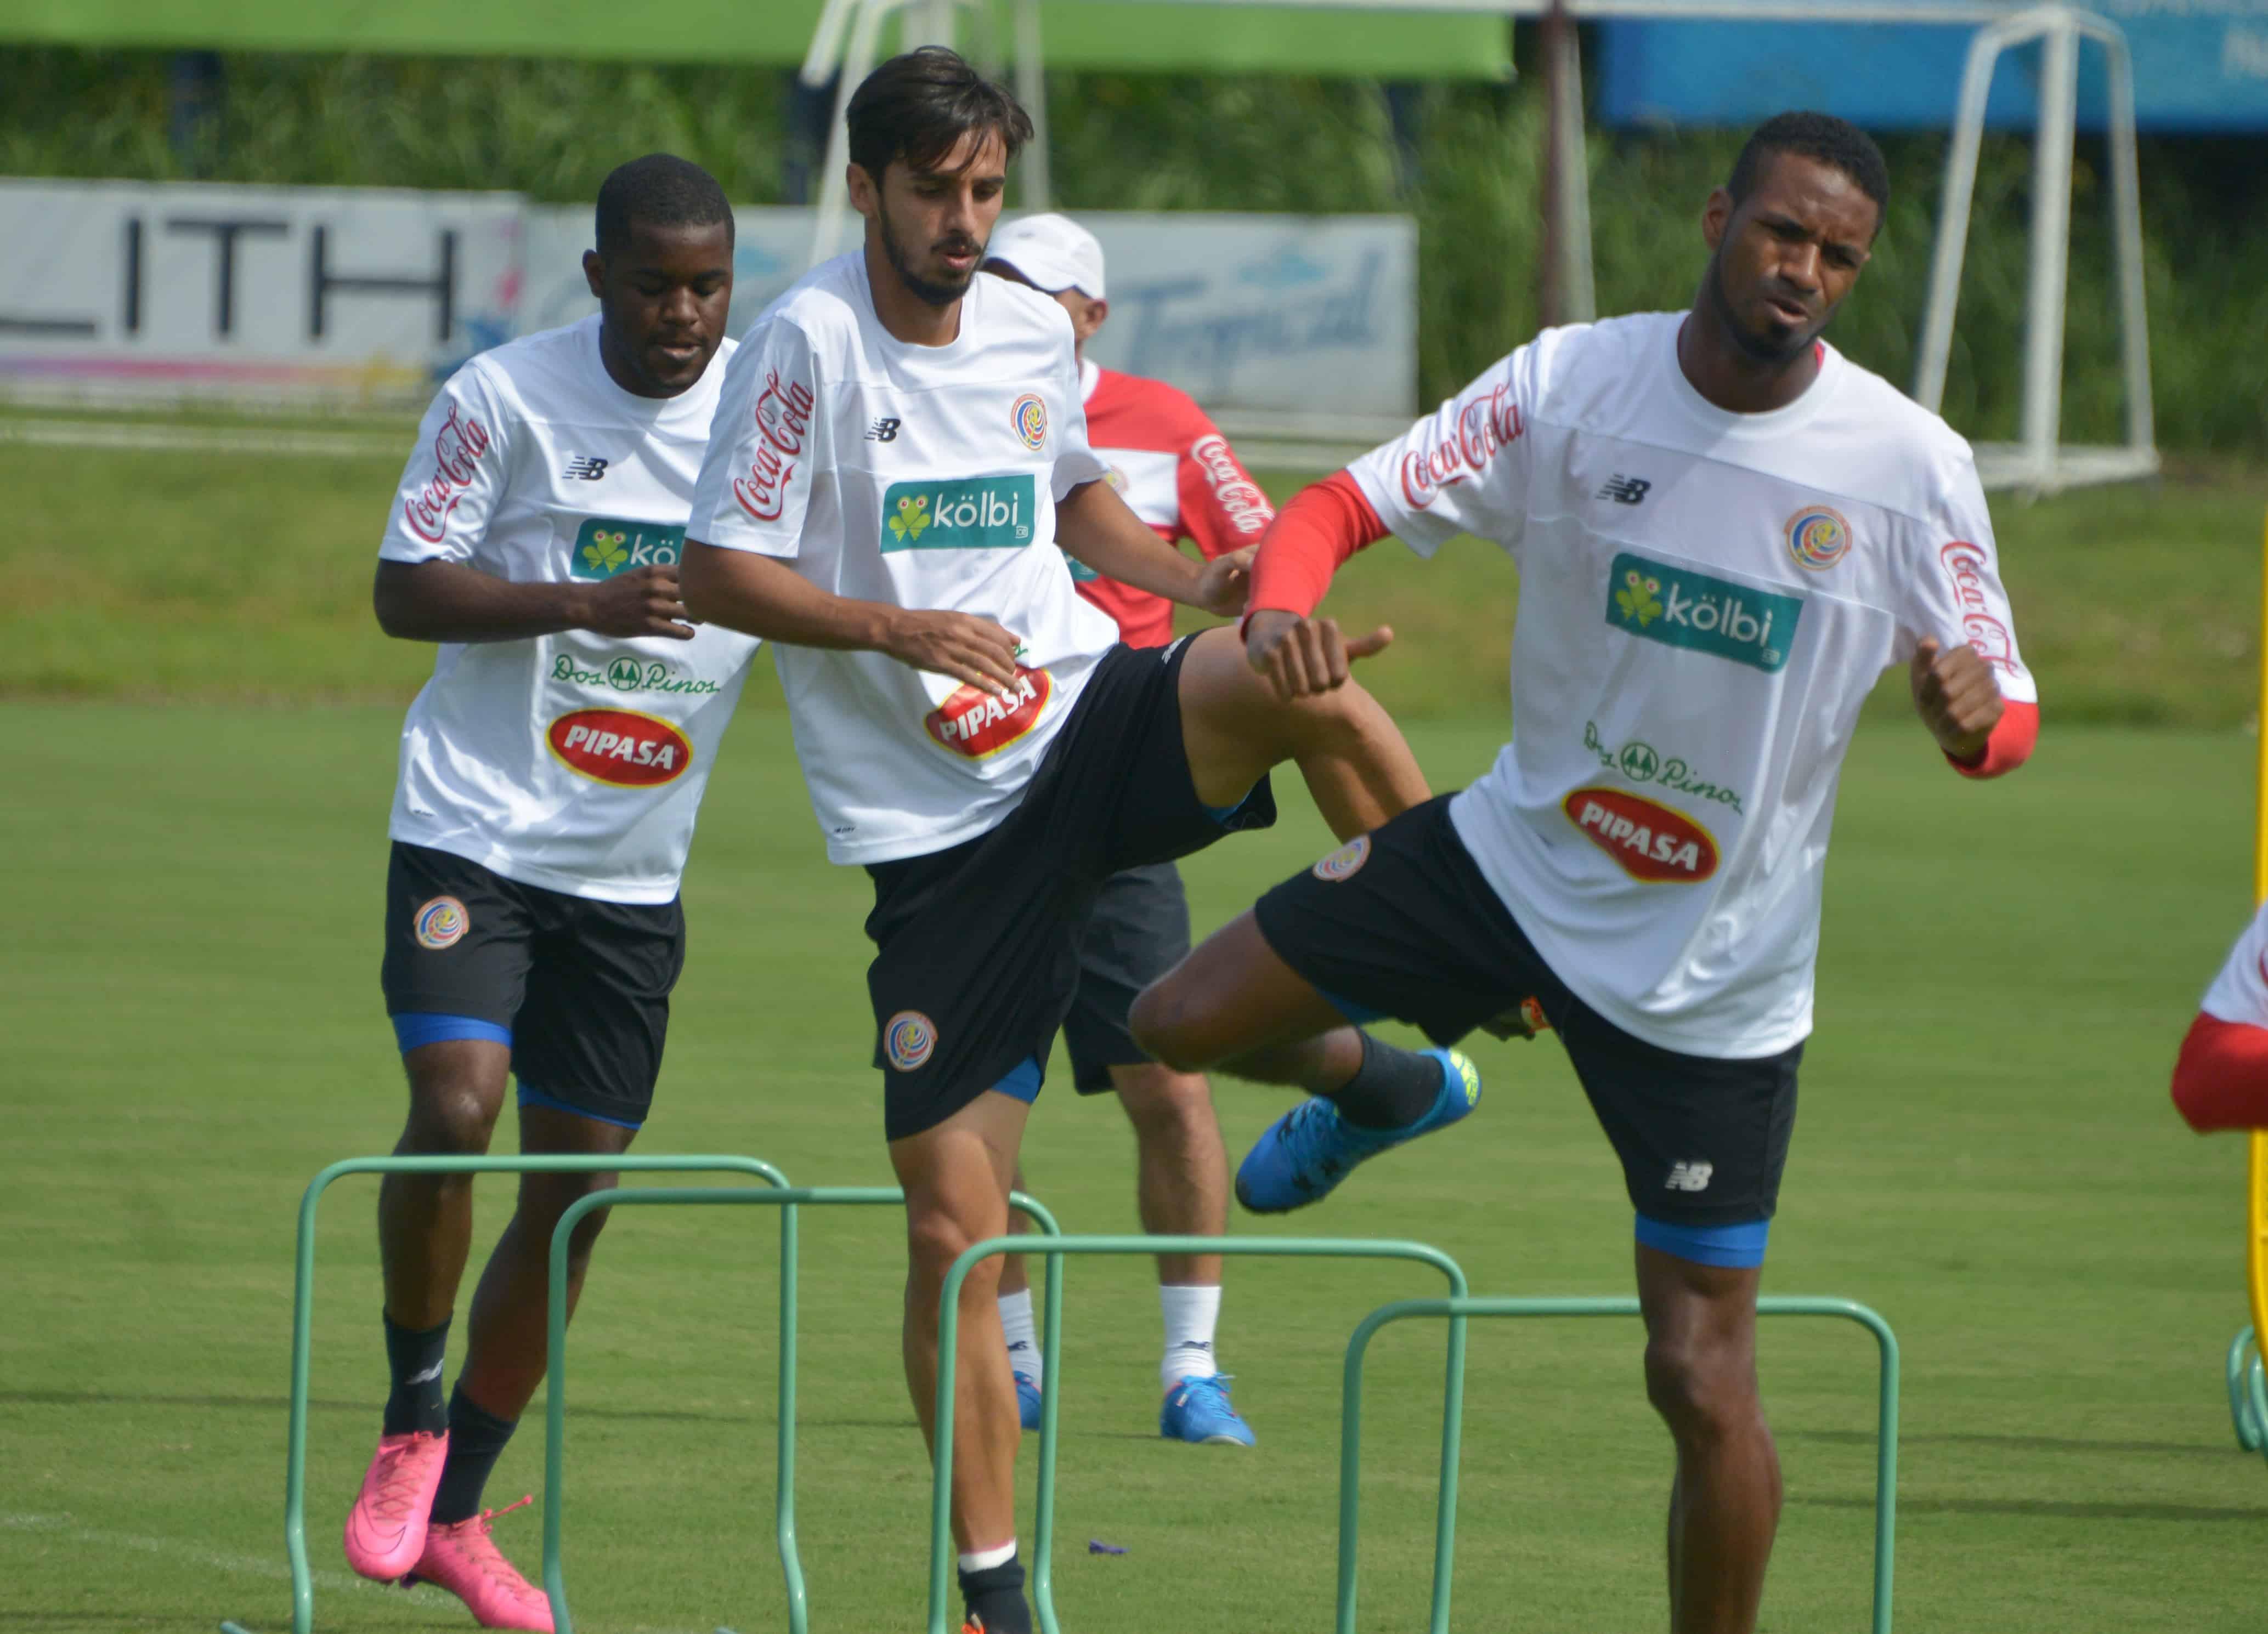 Costa Rica football players Joel Campbell, Bryan Ruiz and Dave Myrie